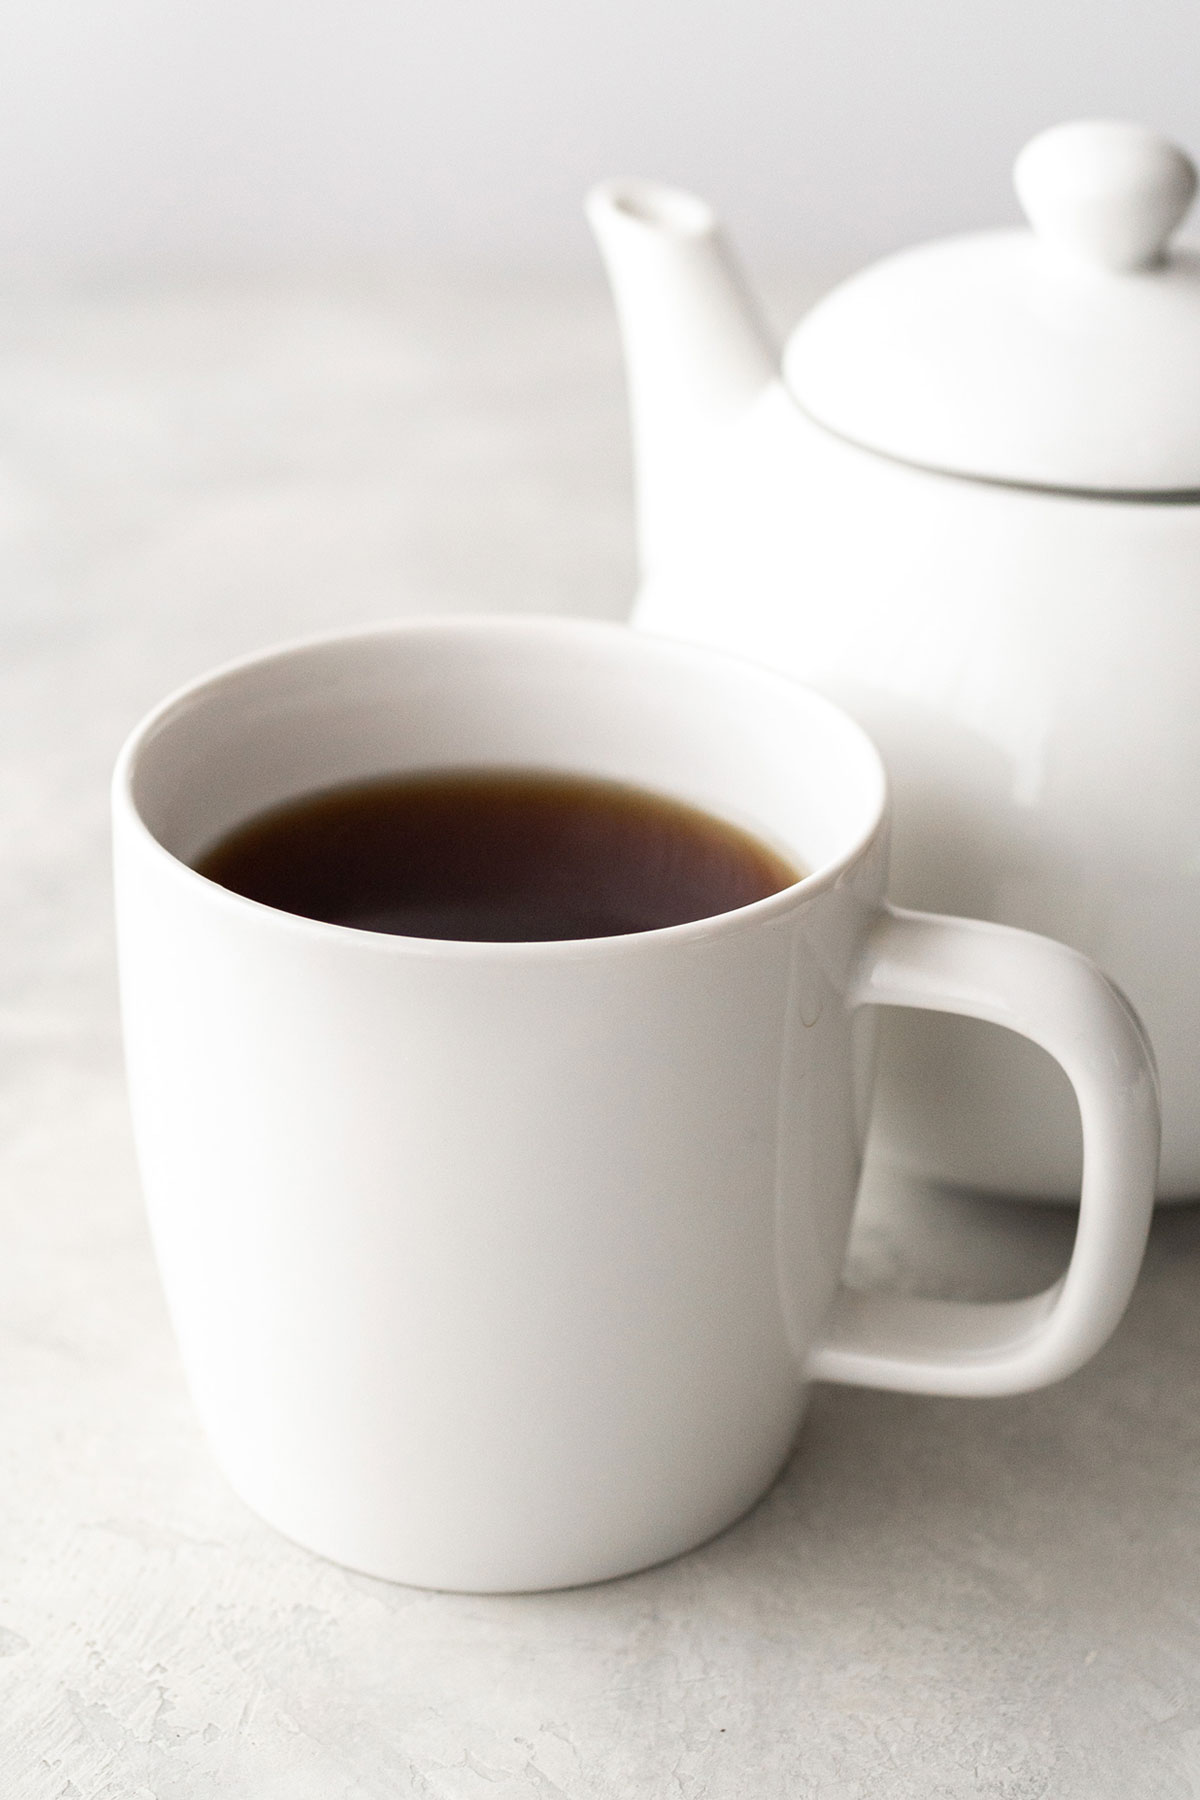 Earl Grey tea in a white ceramic mug.